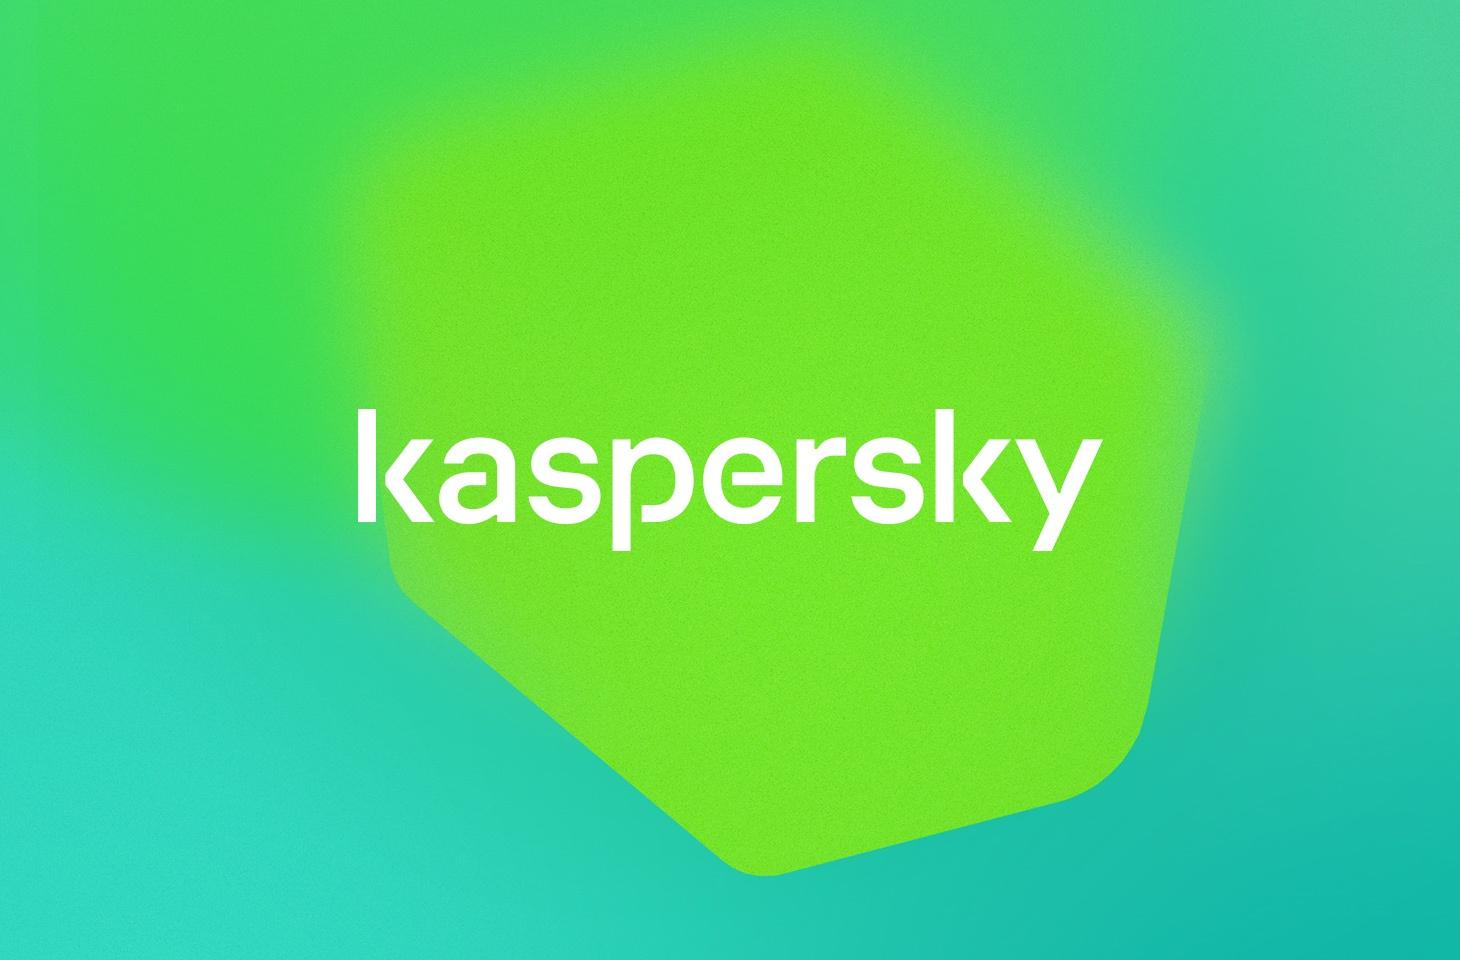 Kaspersky's head of brand design explains how we engineered the new brand